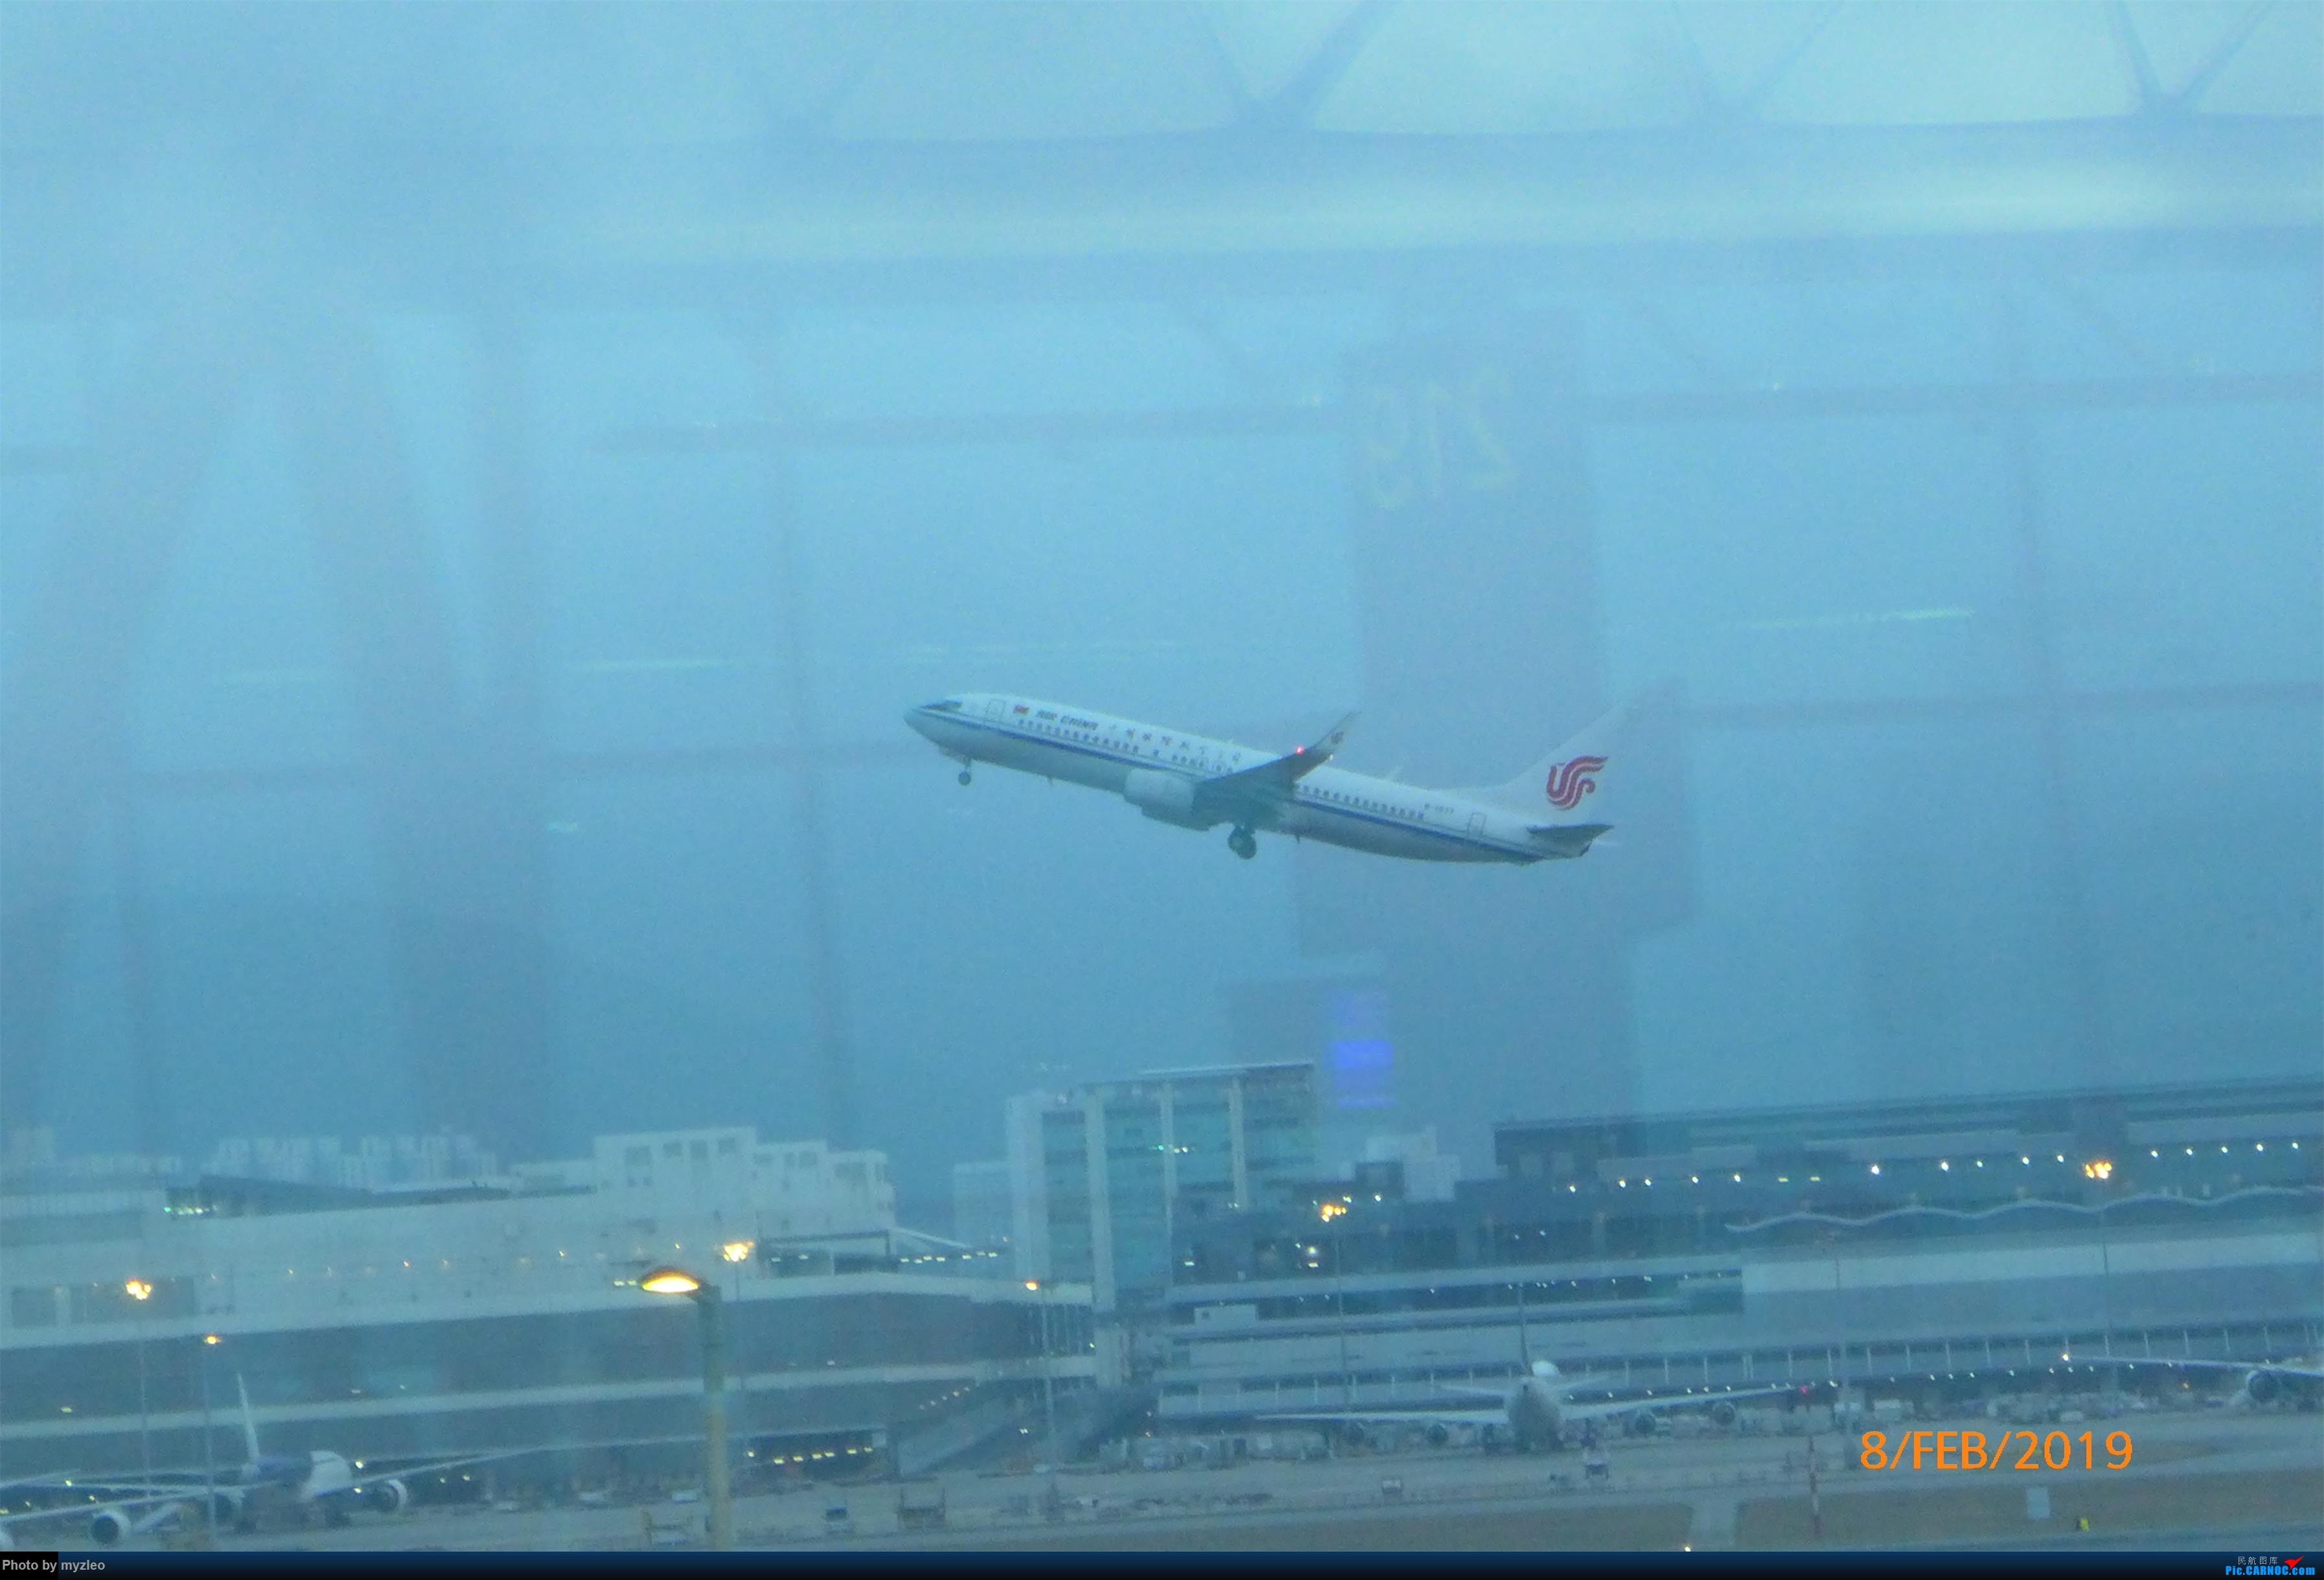 Re:[原创]【myzleo的游记4.5】十年之约(5)在香港的最后一天,搭乘港航333回沪 BOEING 737-800 B-1977 中国香港国际机场